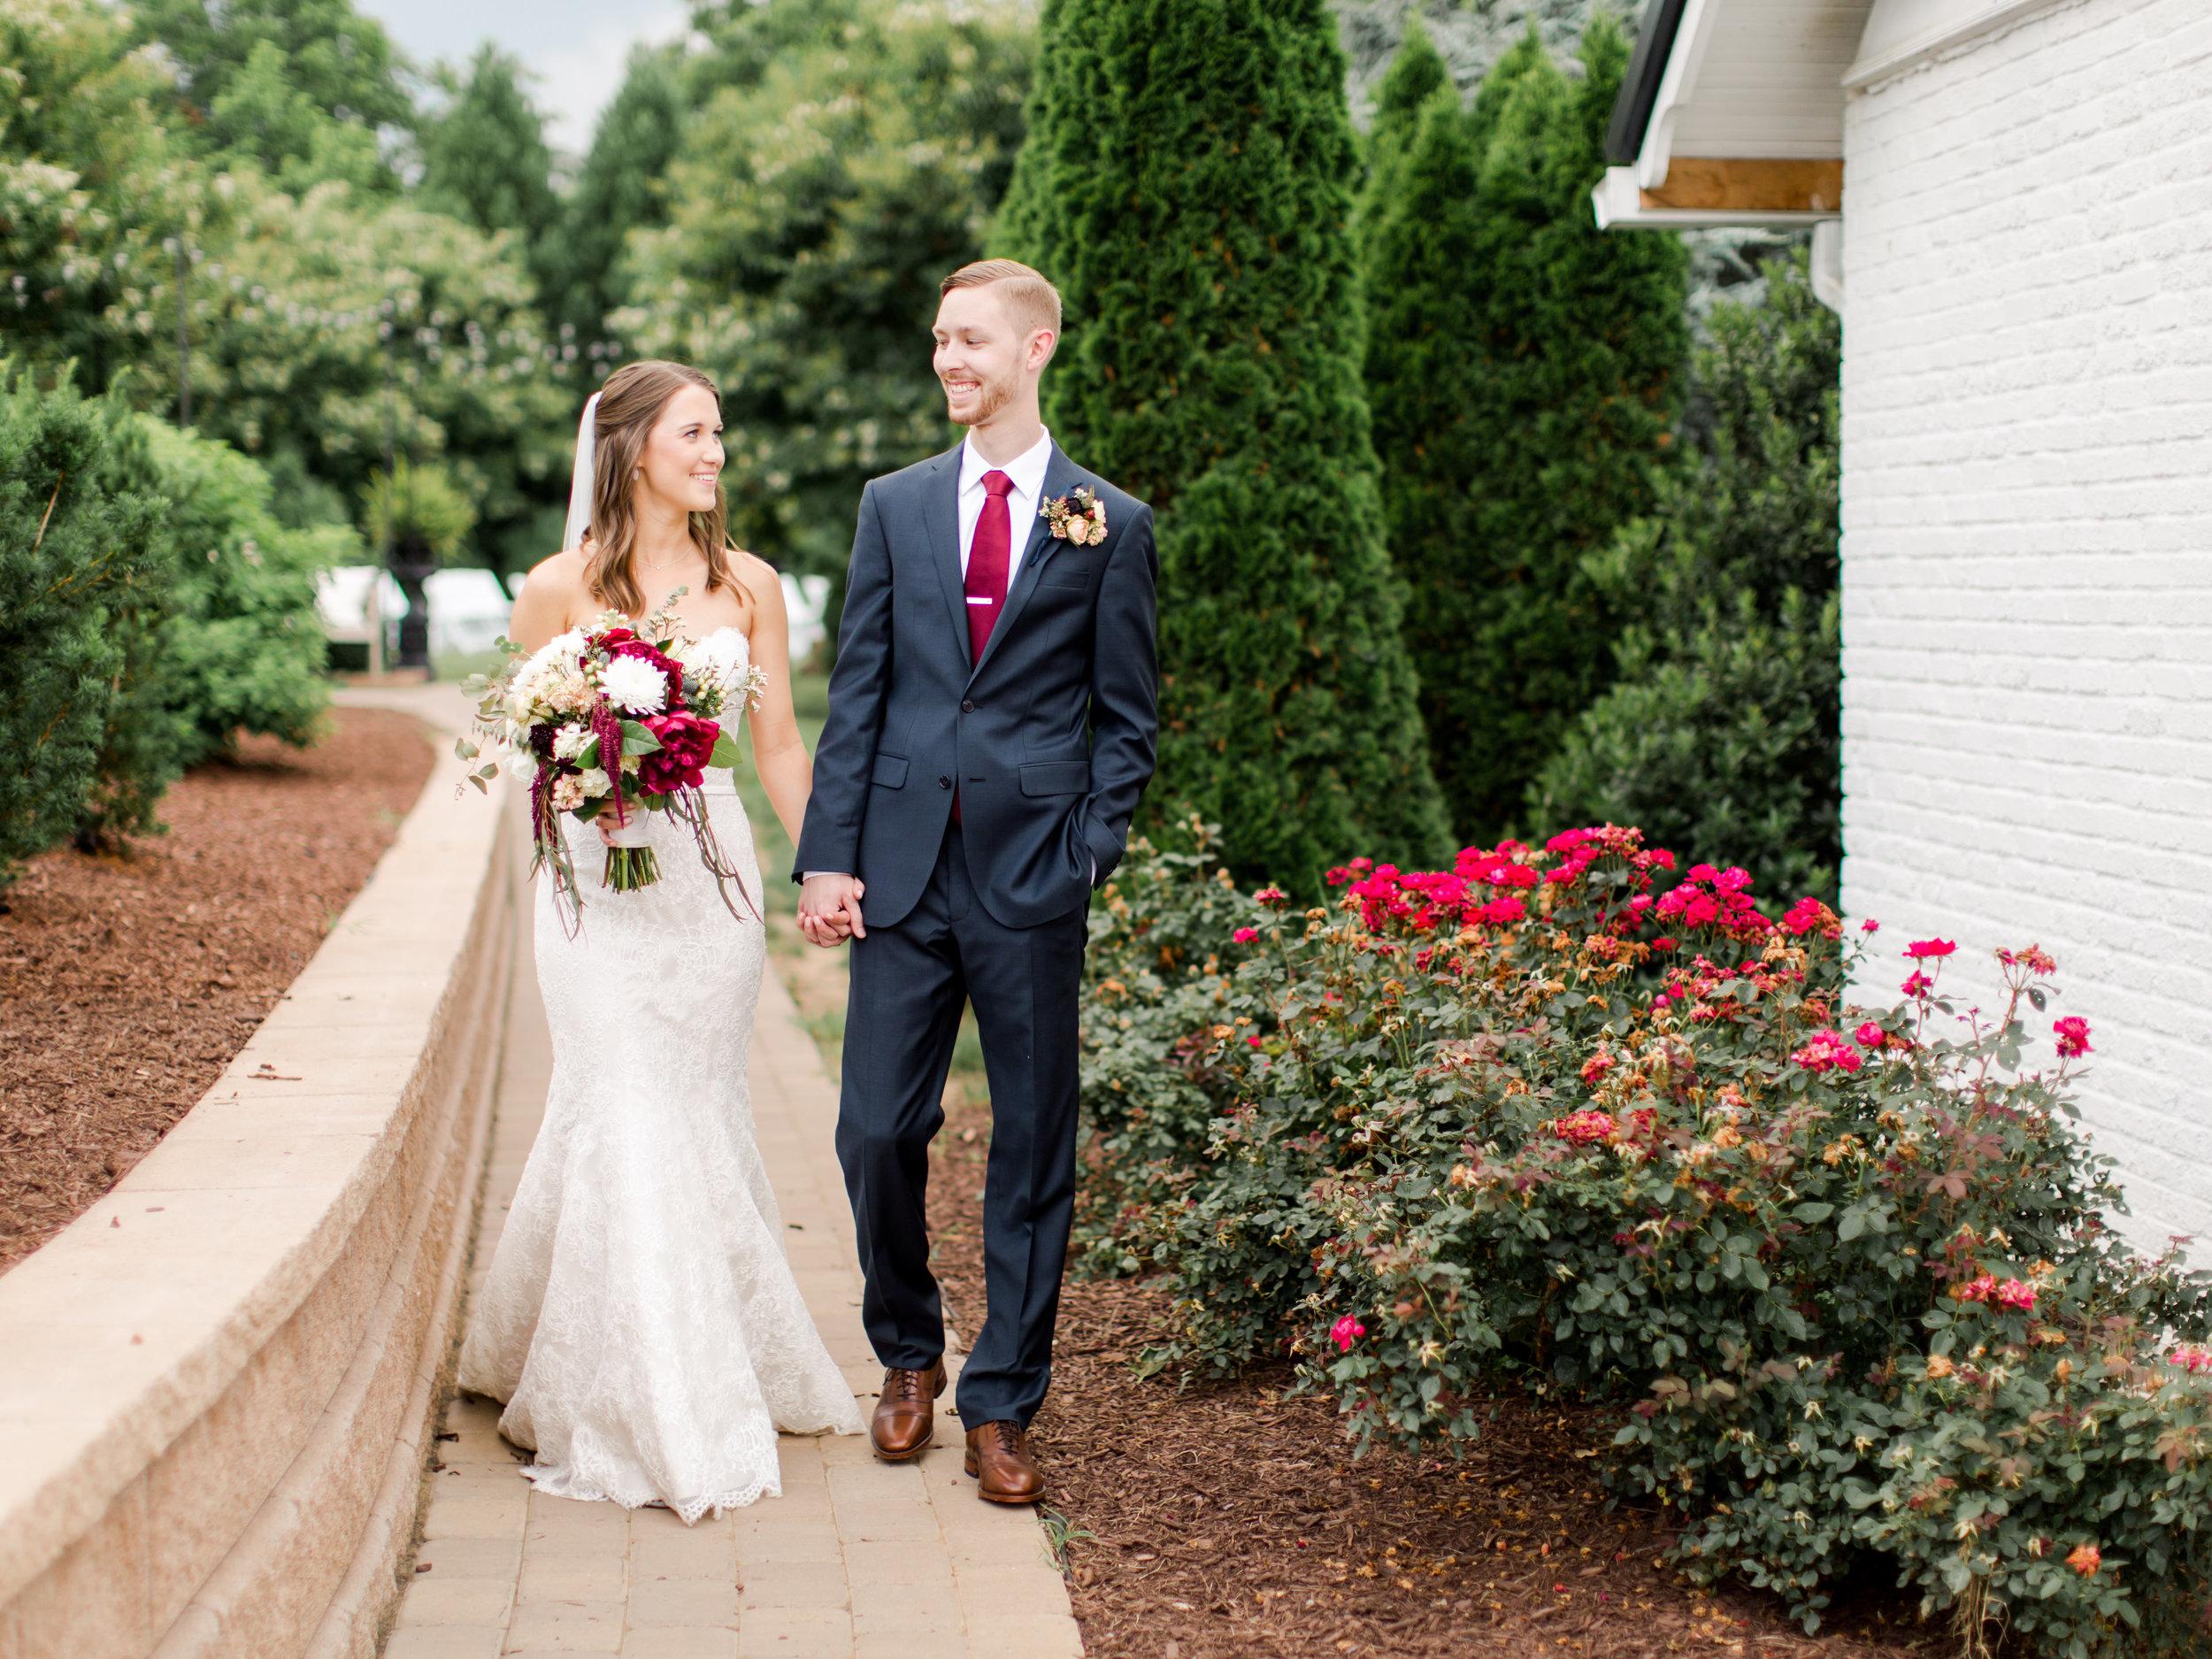 roanoke-virginia-wedding-photographer-plantation-on-sunnybrook-meredith-and-logan-918.jpg